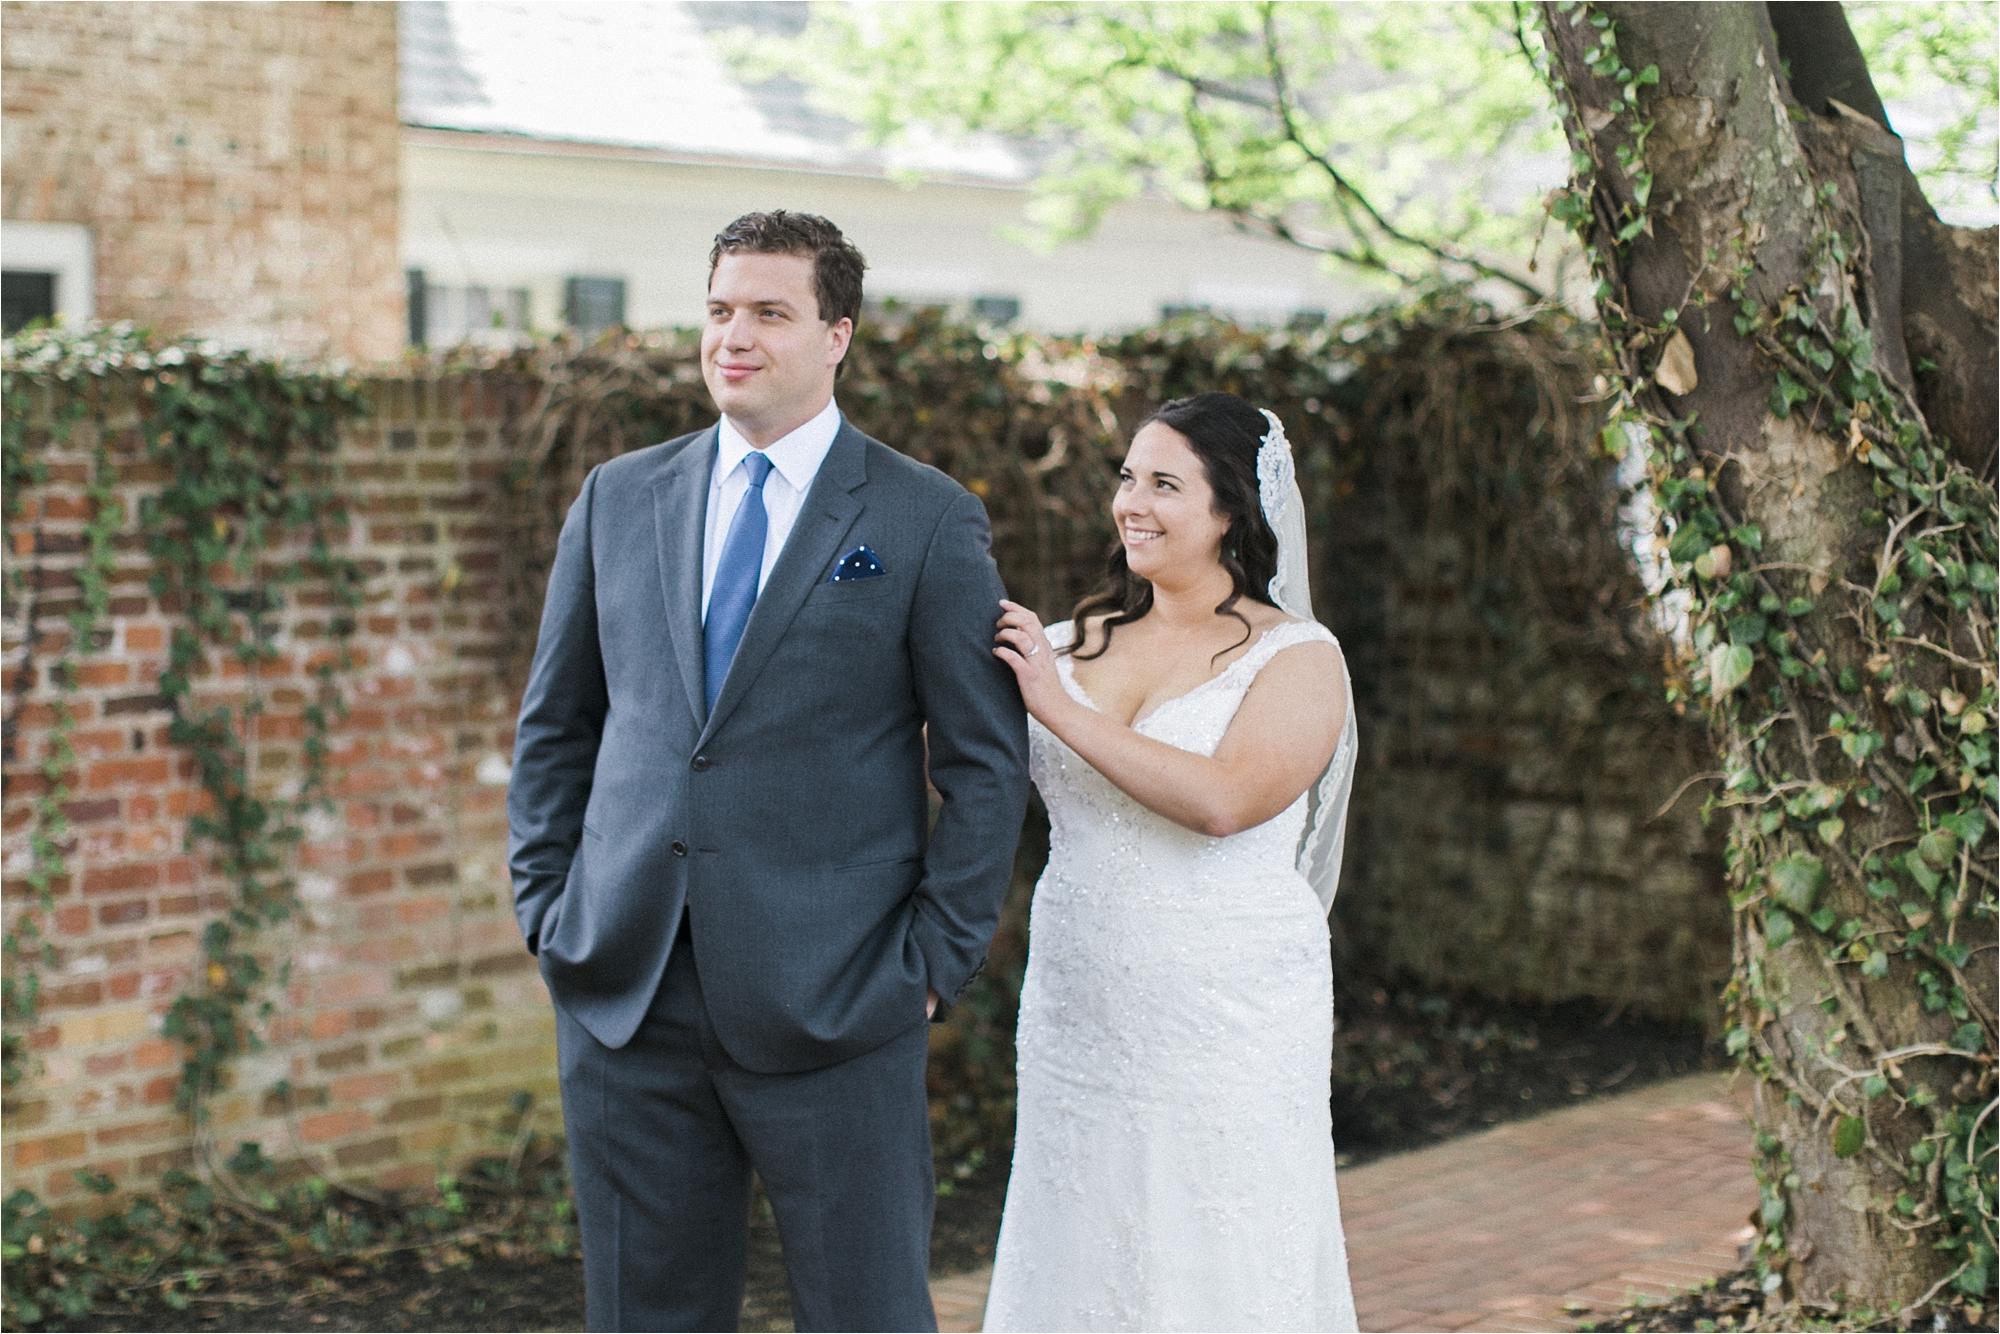 tom-jill-baltimore-maryland-industrial-elegant-wedding-009.JPG